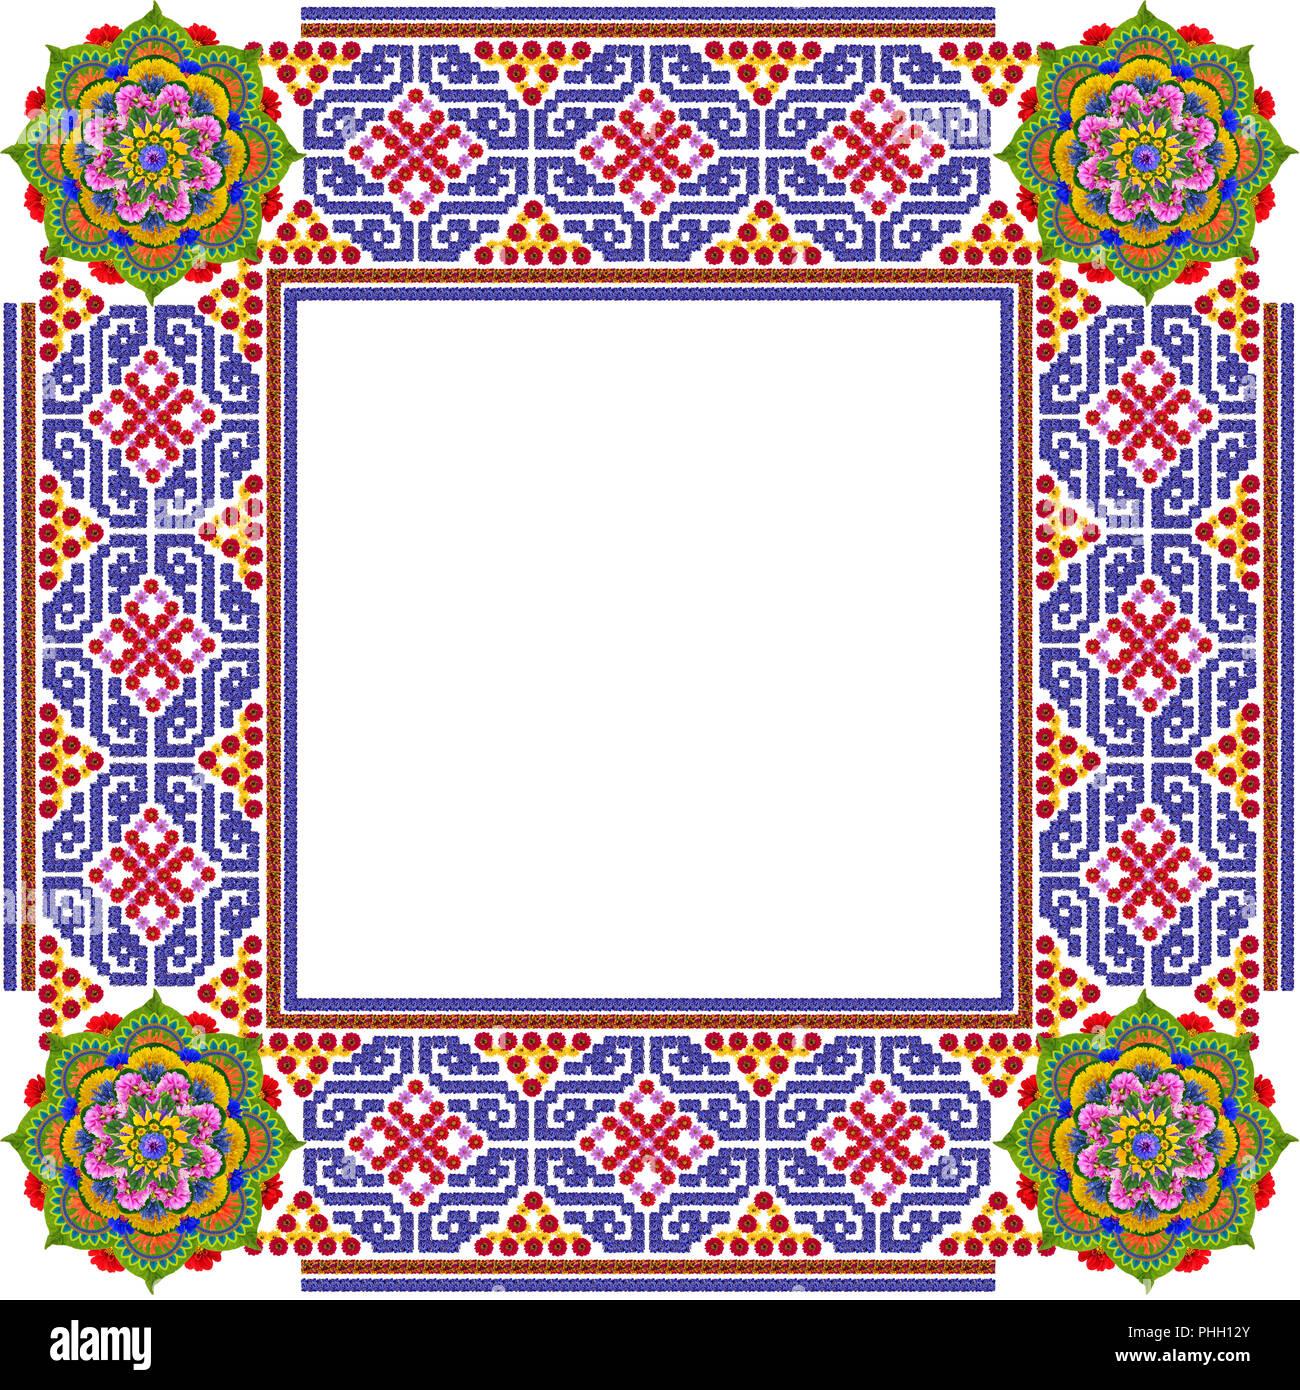 Square simple mandalas photo frame Stock Photo: 217347619